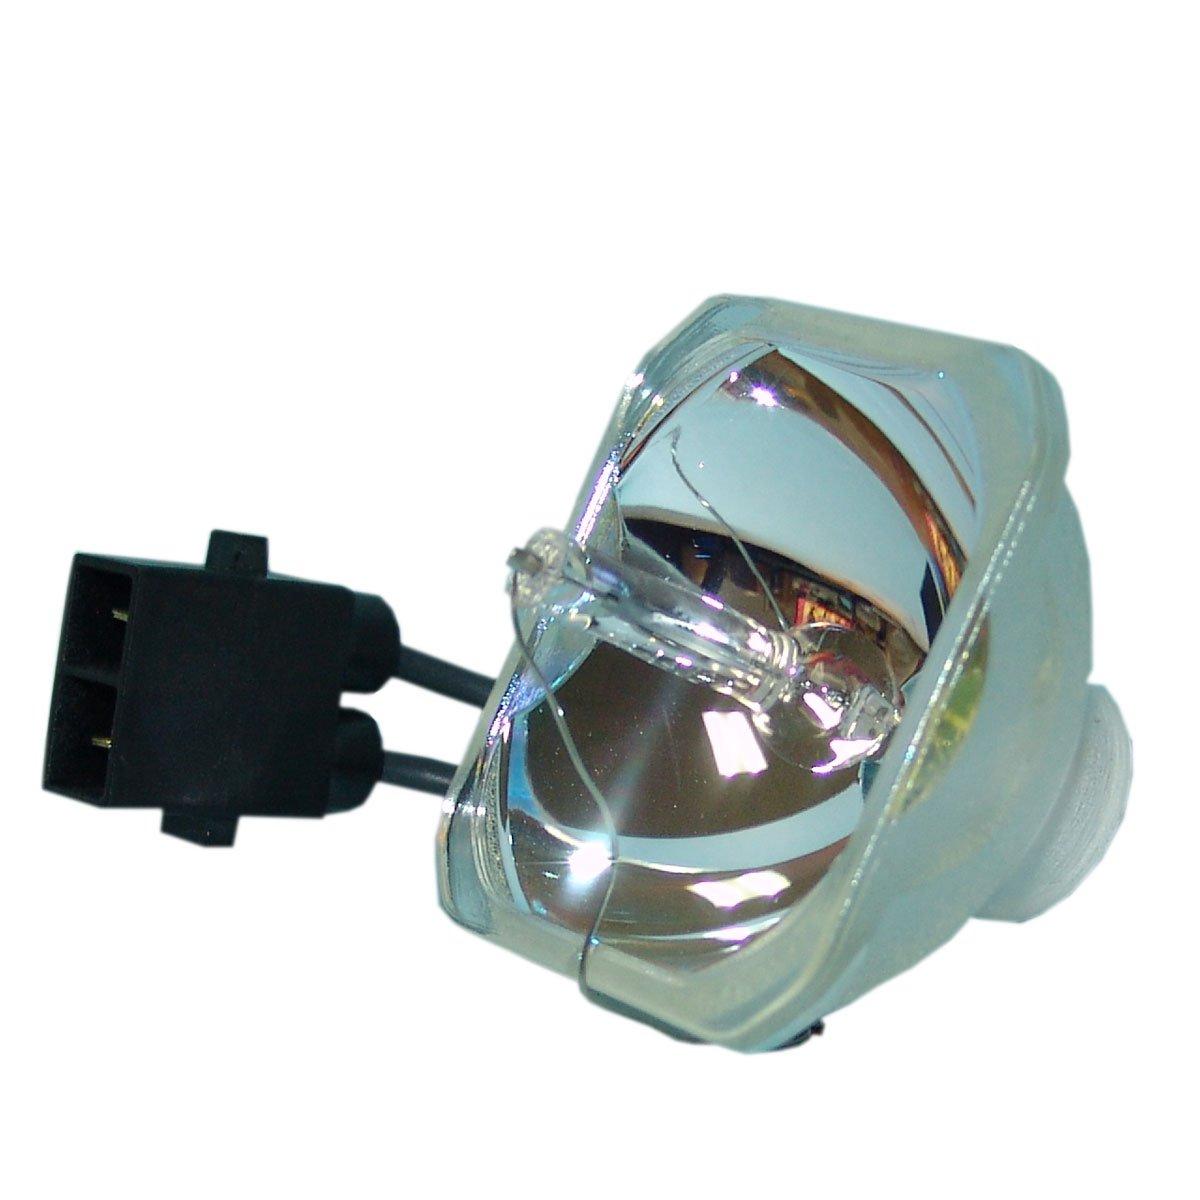 Lutema プロジェクター交換用ランプ ハウジング/電球付き Epson PowerLite 260d用 Economy Economy Lamp Only B07KTL21CP